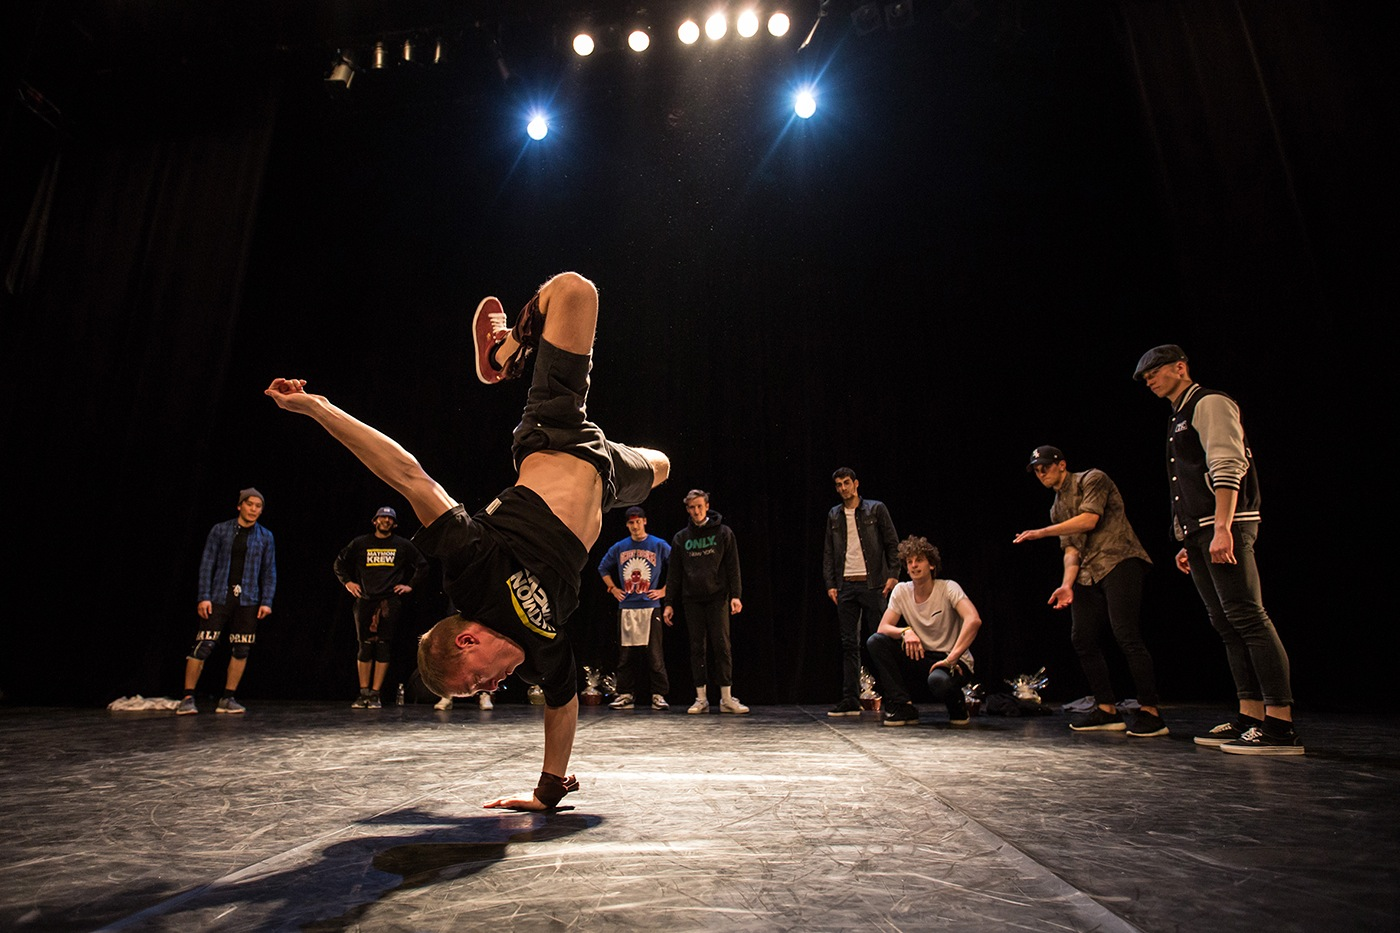 photographe-reportage-danse-avec-ton-crous-guillaume-heraud-039-small